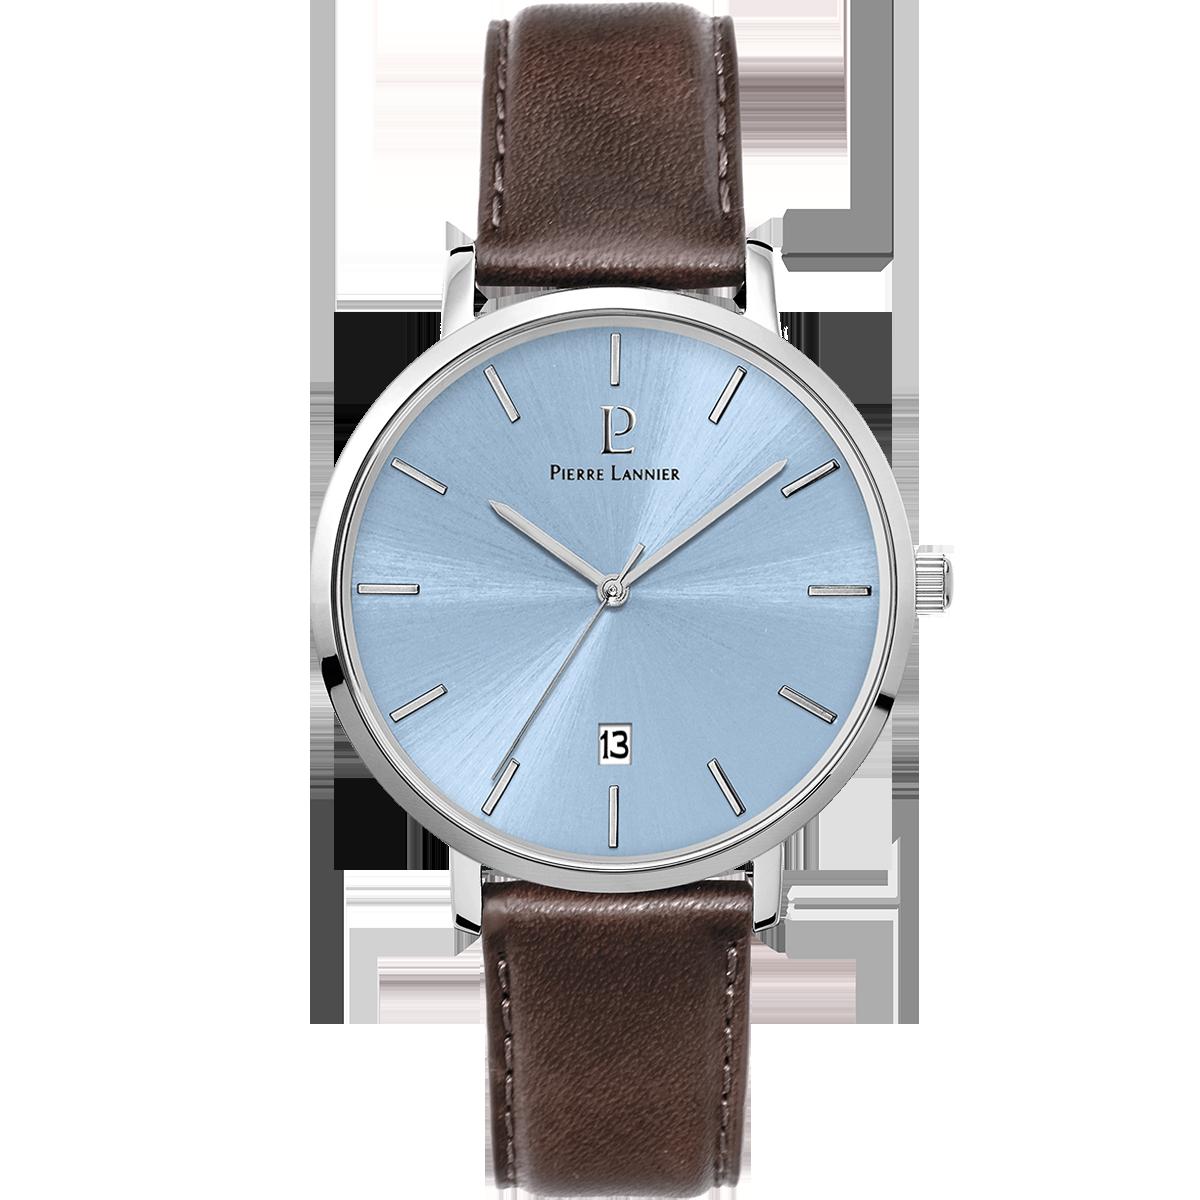 Мужские часы Pierre Lannier Echo 258L184